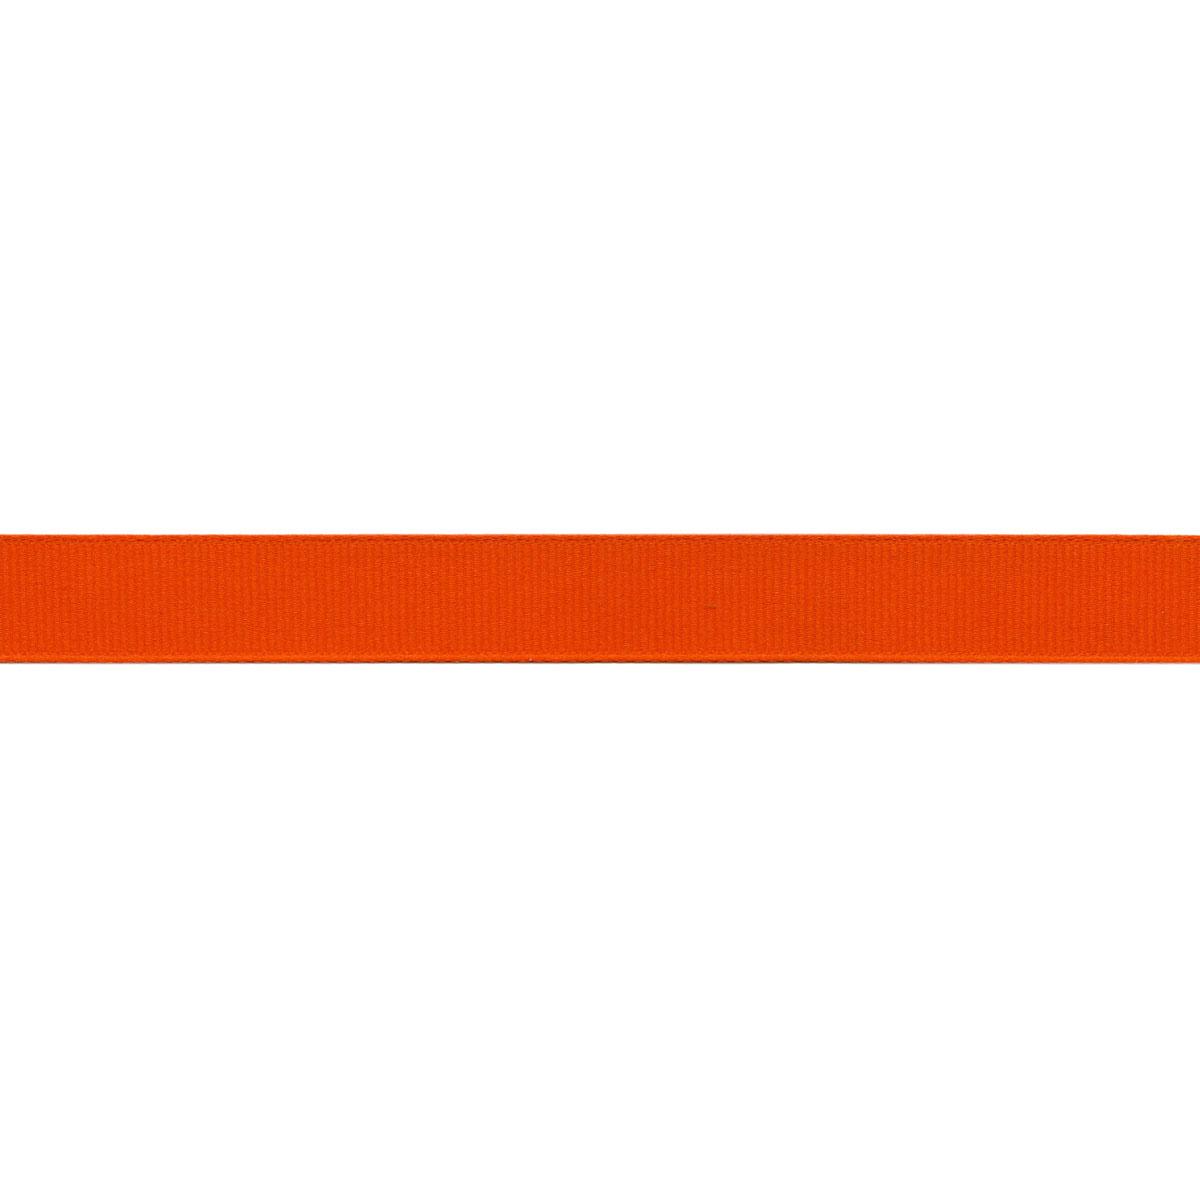 "Grosgrain Ribbon 5/8""X20yd-Torrid Orange - image 1 de 1"